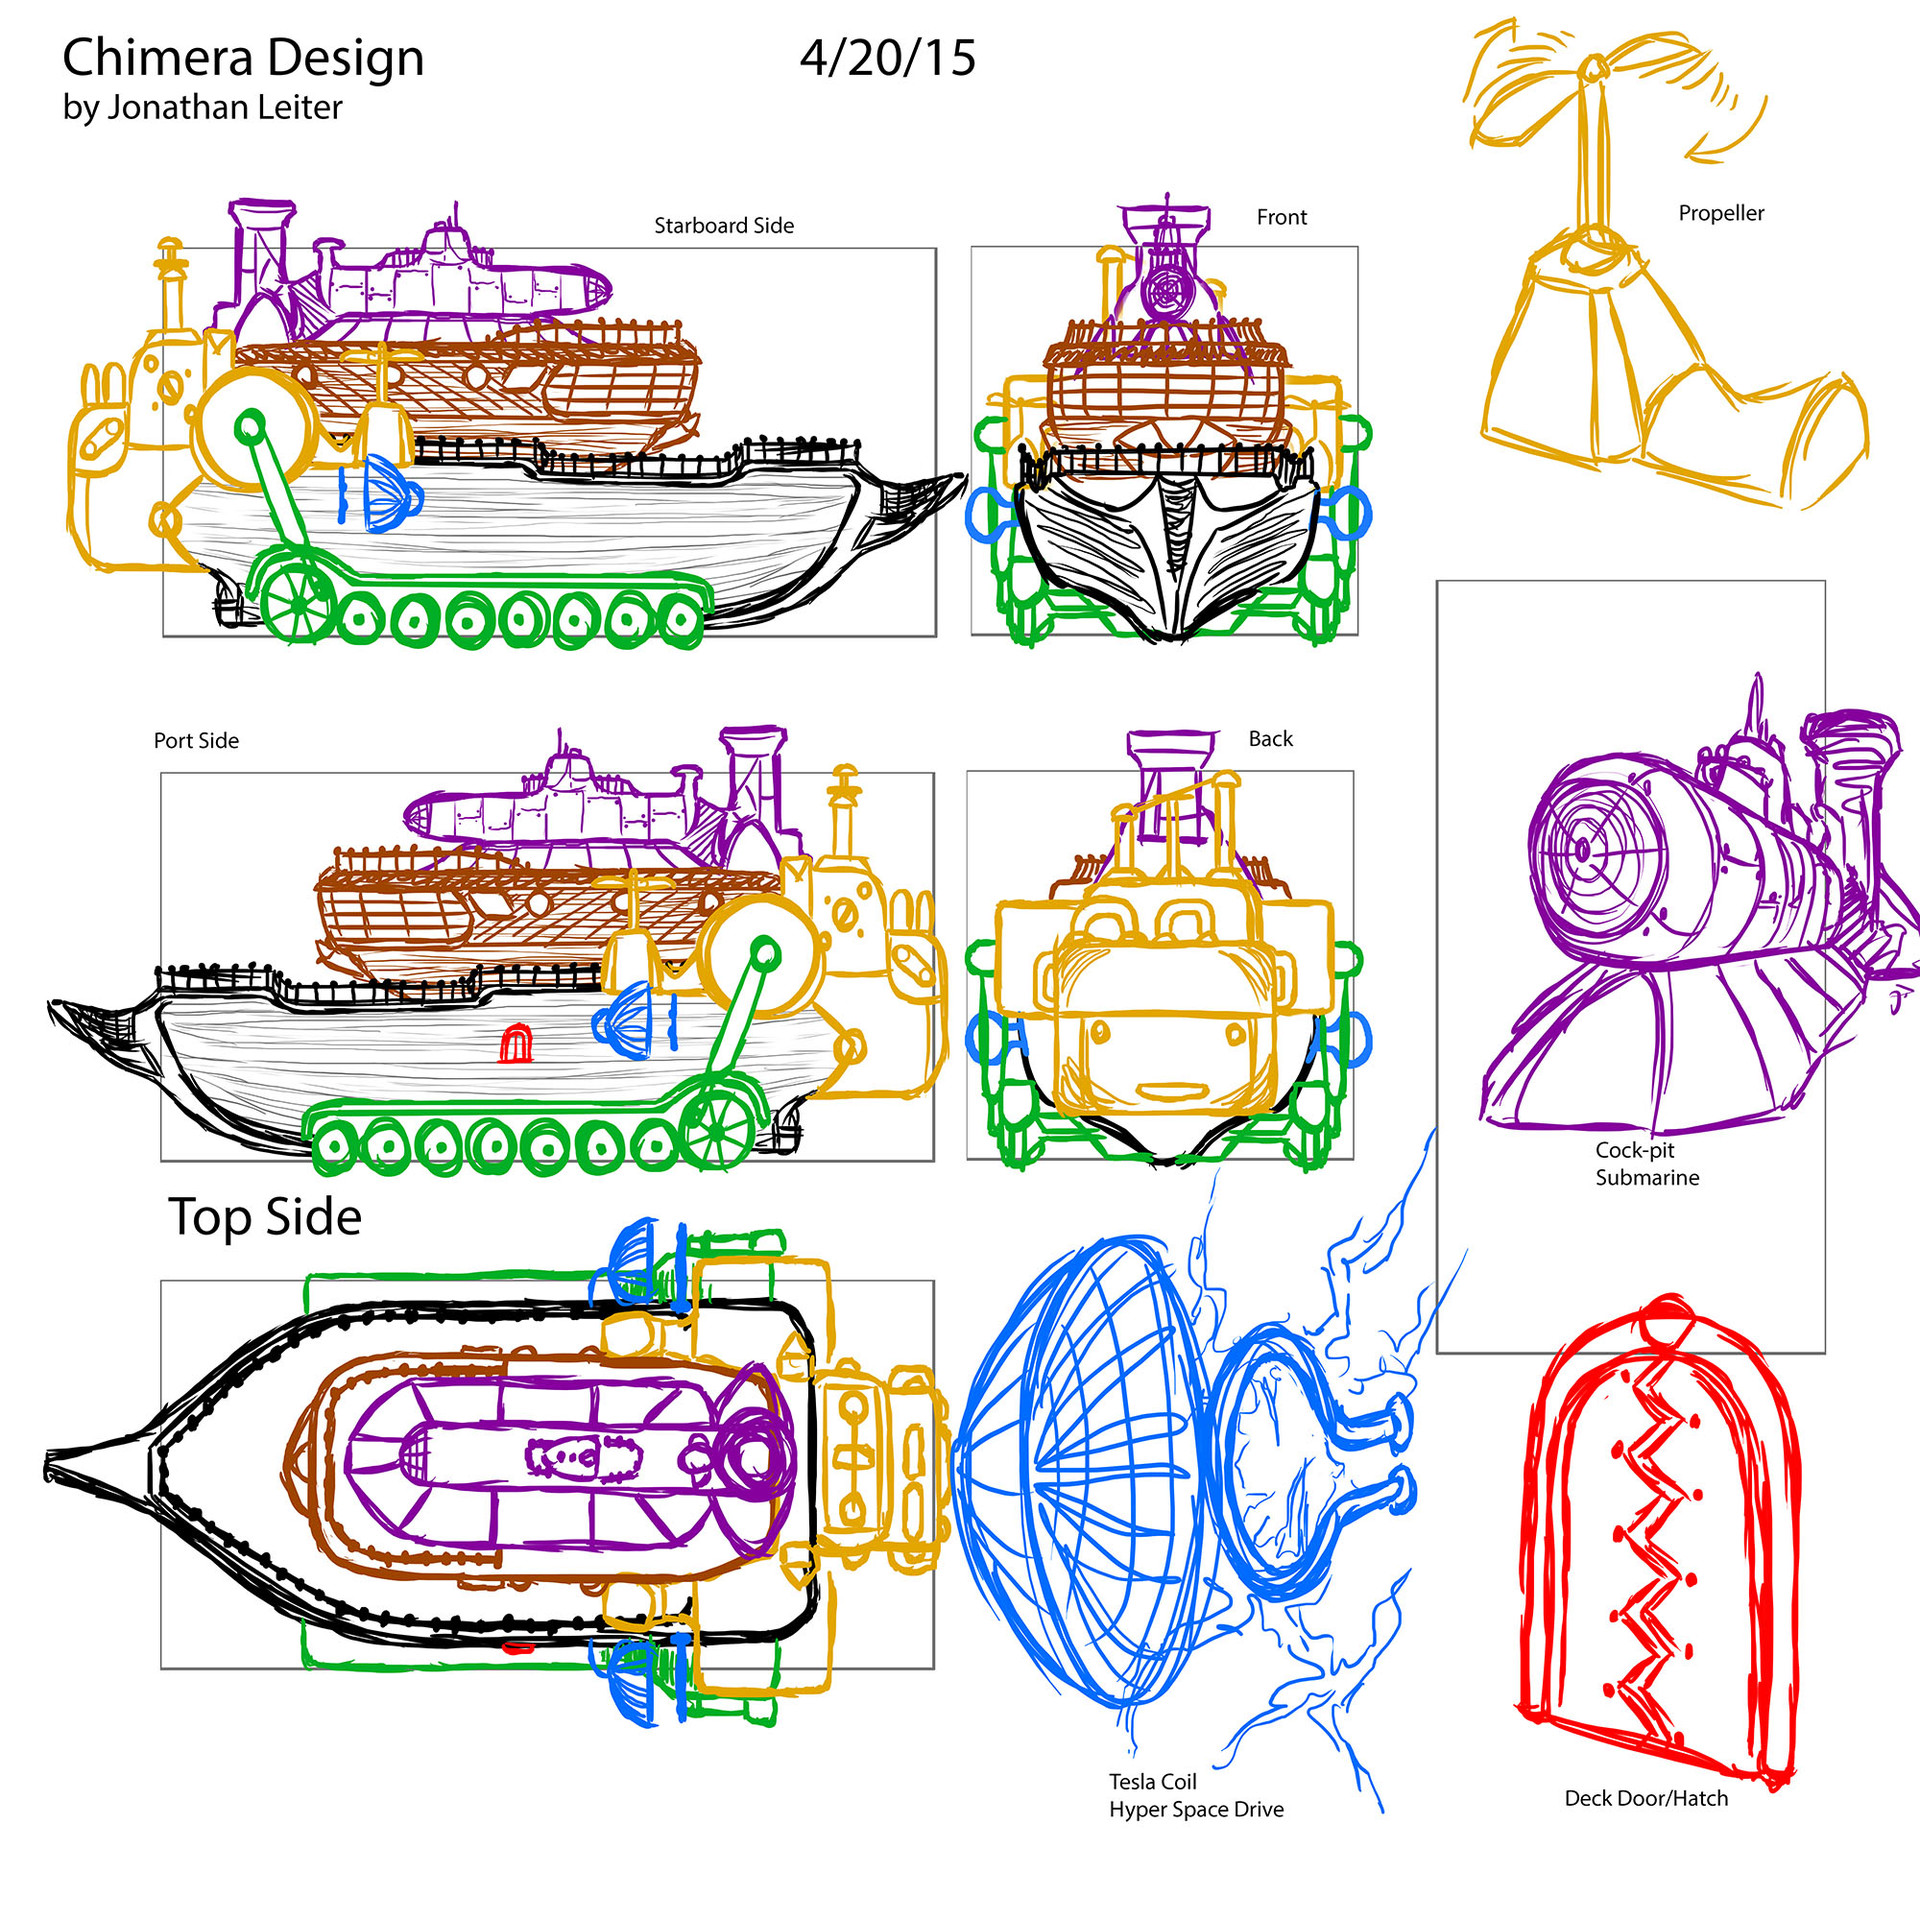 ArtStation - Chimera Space Ship - Exterior Design, Jonathan Leiter